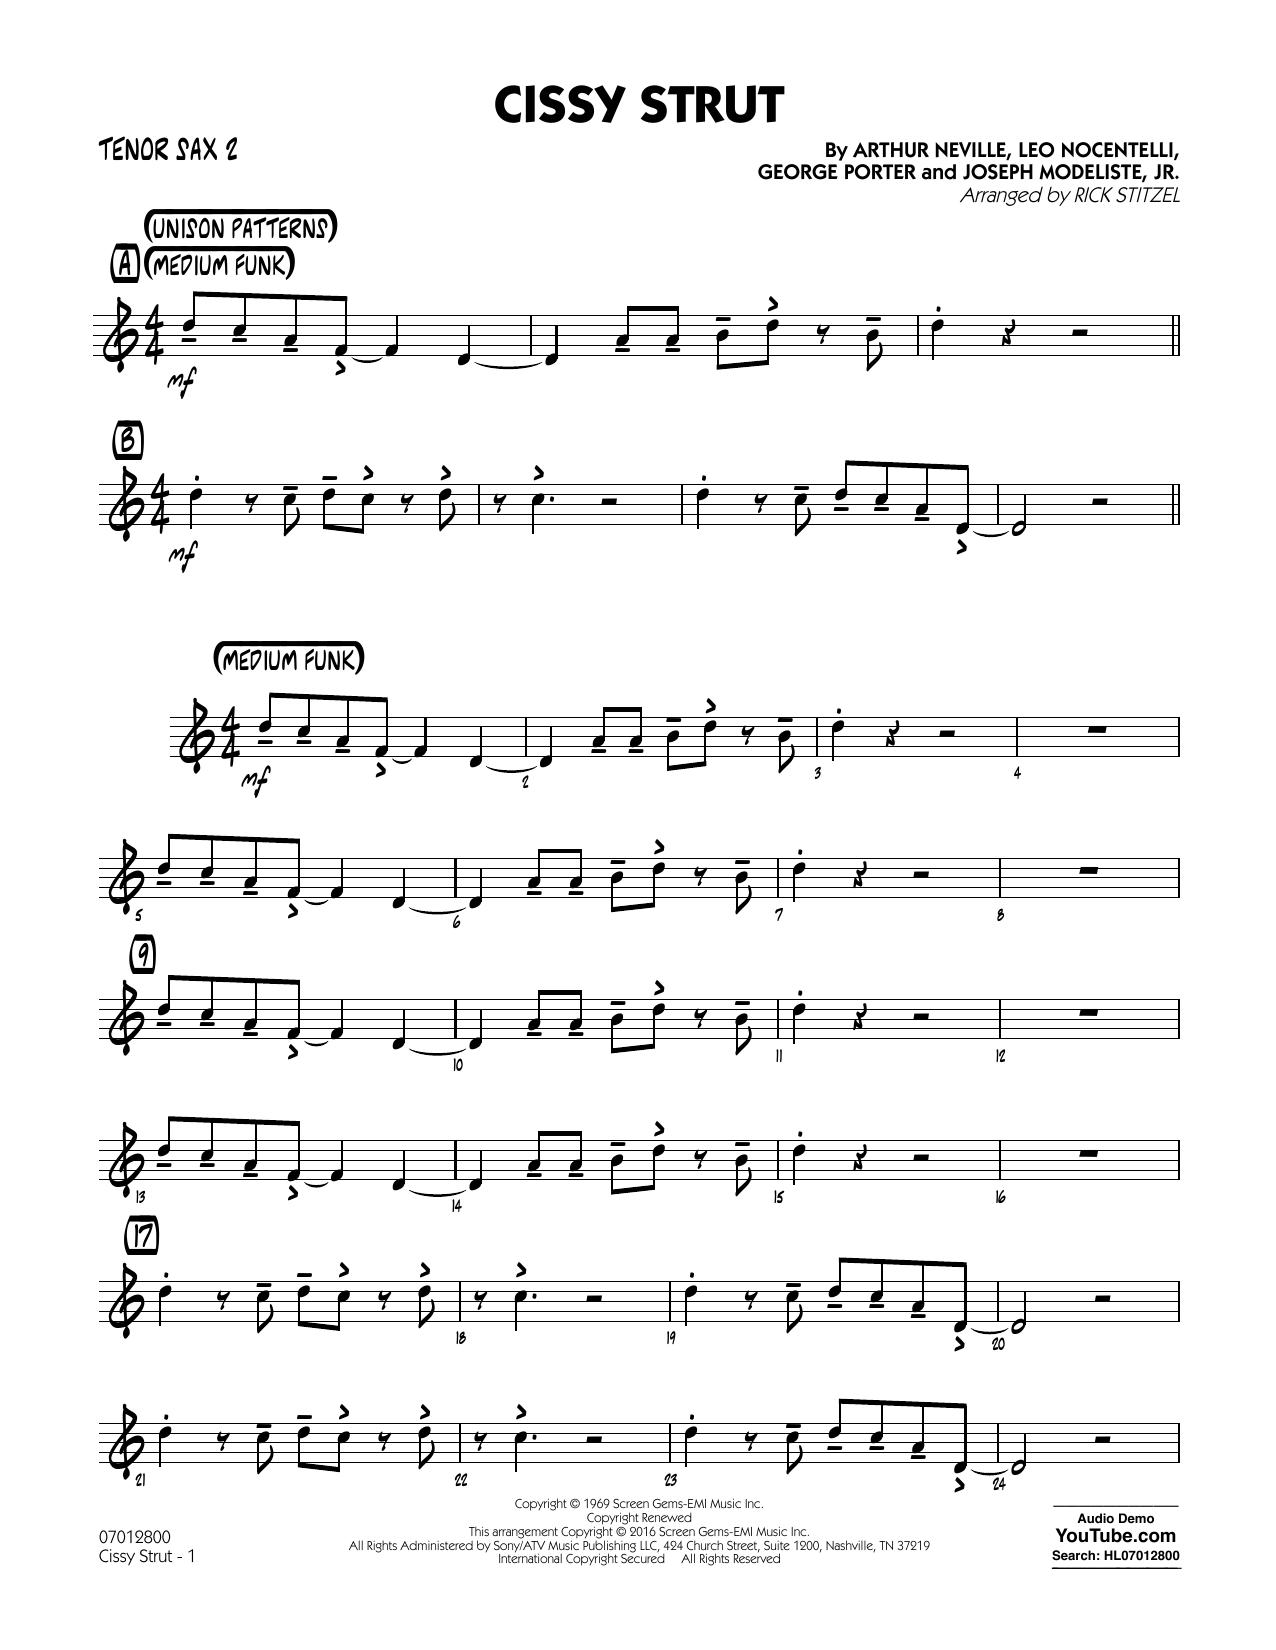 George Porter - Cissy Strut - Tenor Sax 2